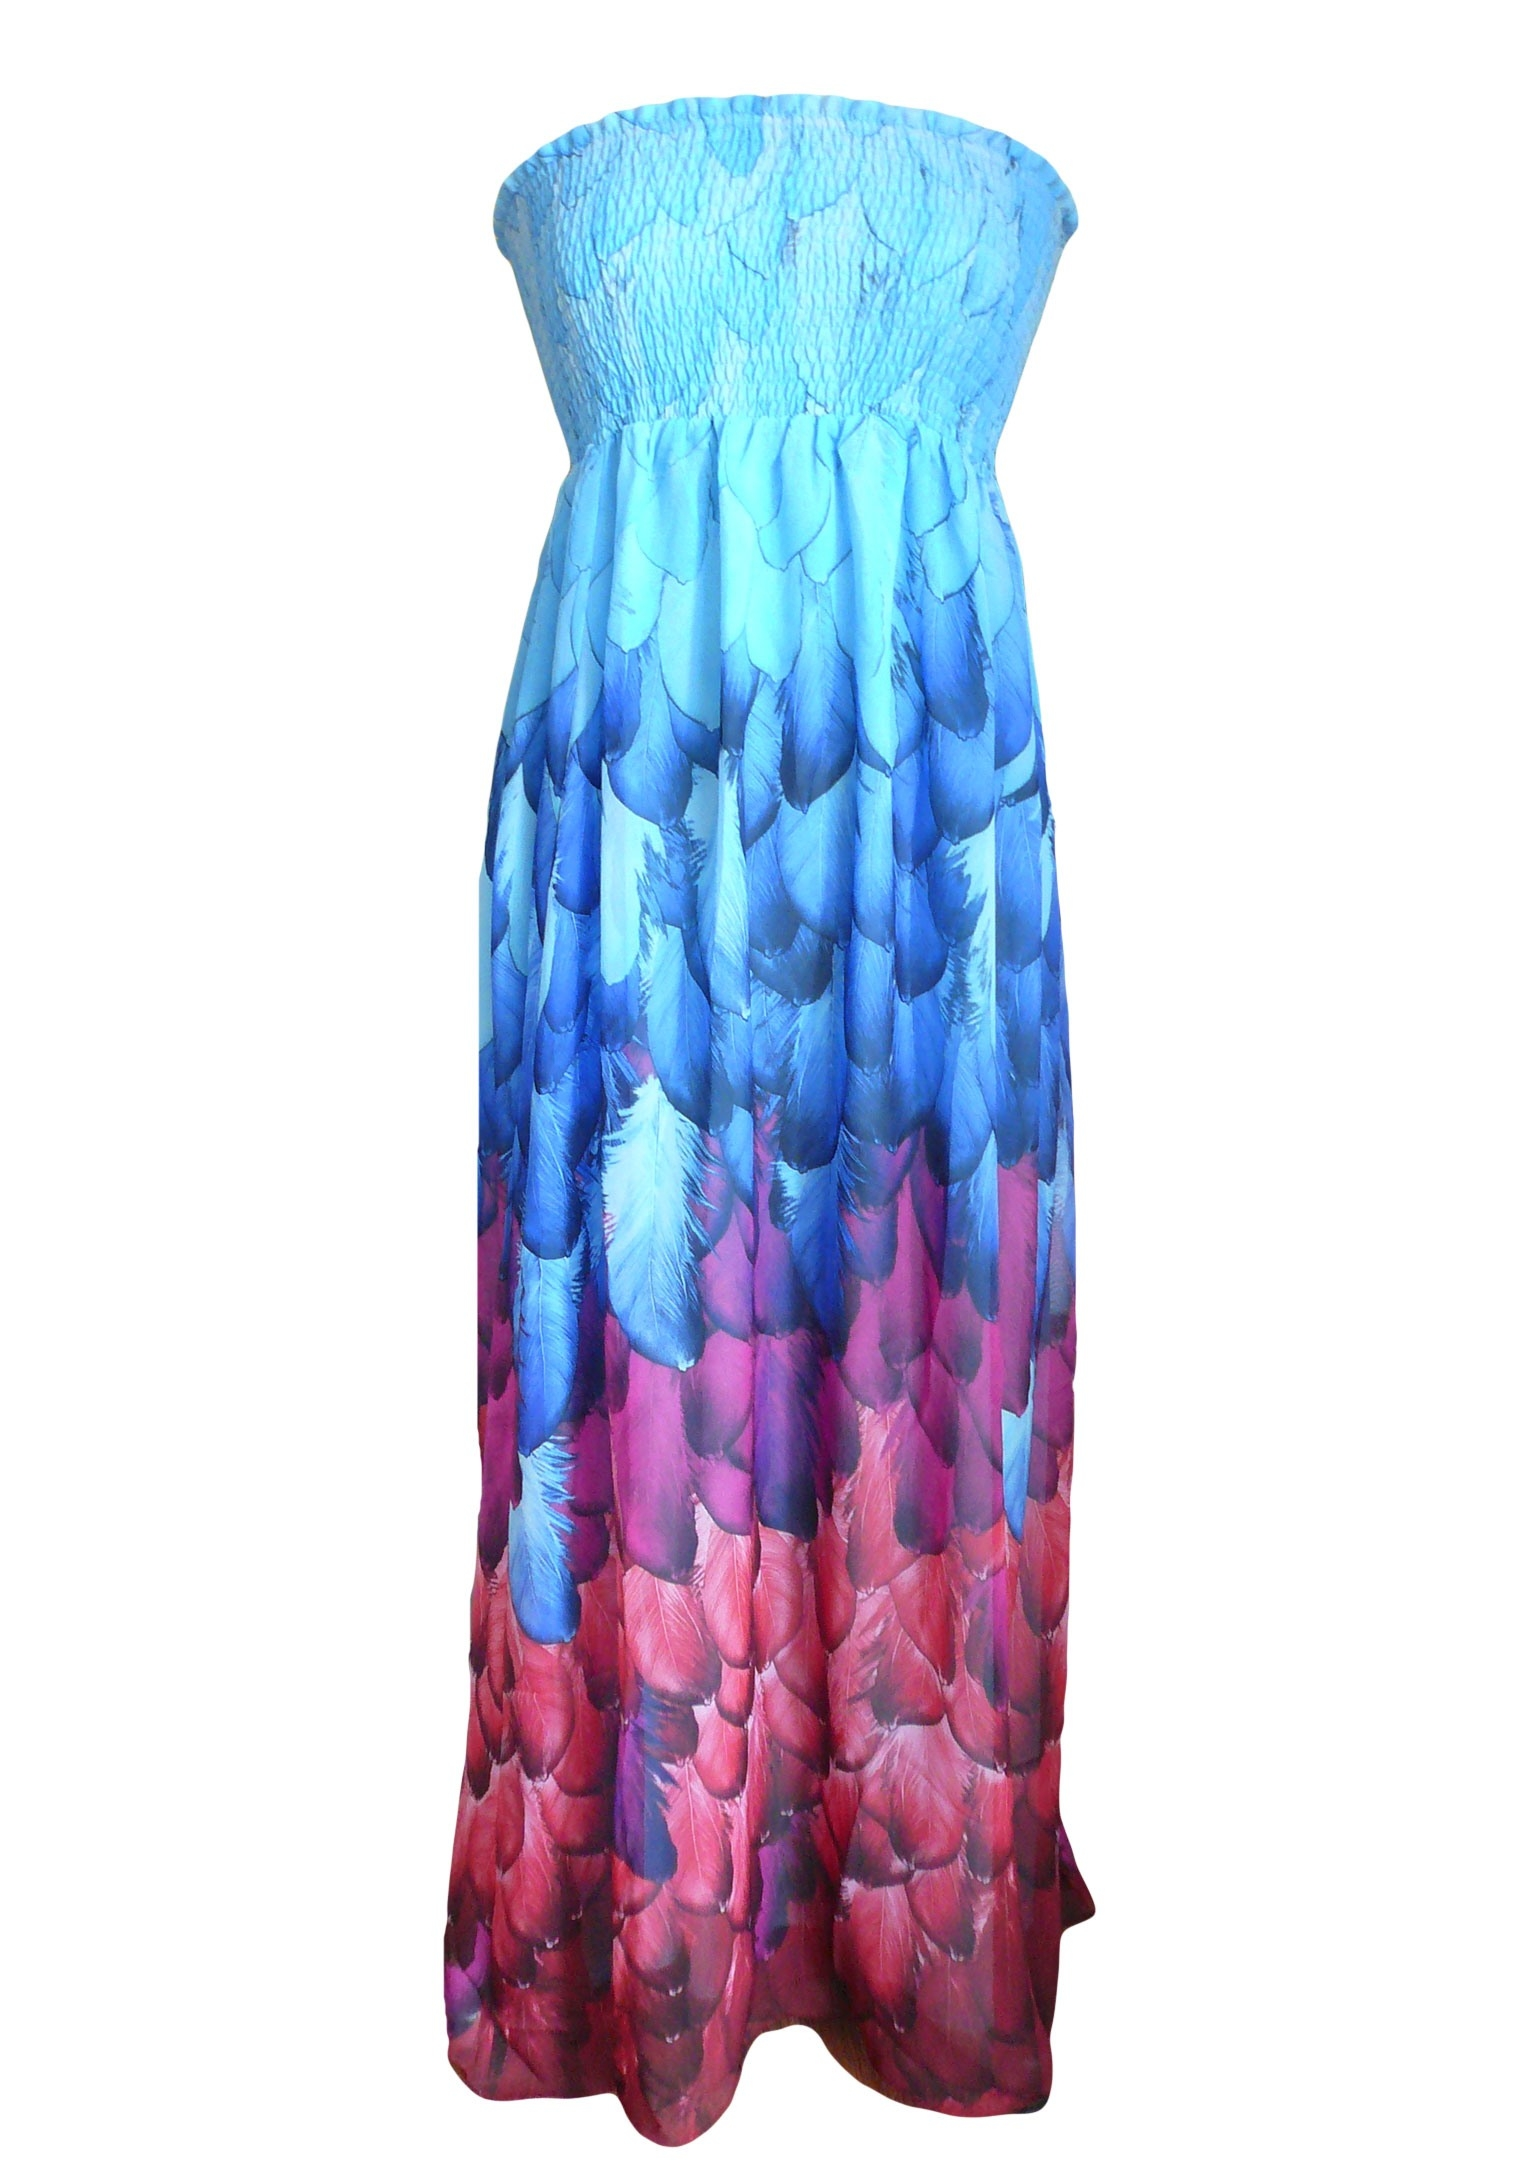 Designer Einfach Kleid Türkis Blau DesignAbend Genial Kleid Türkis Blau Bester Preis